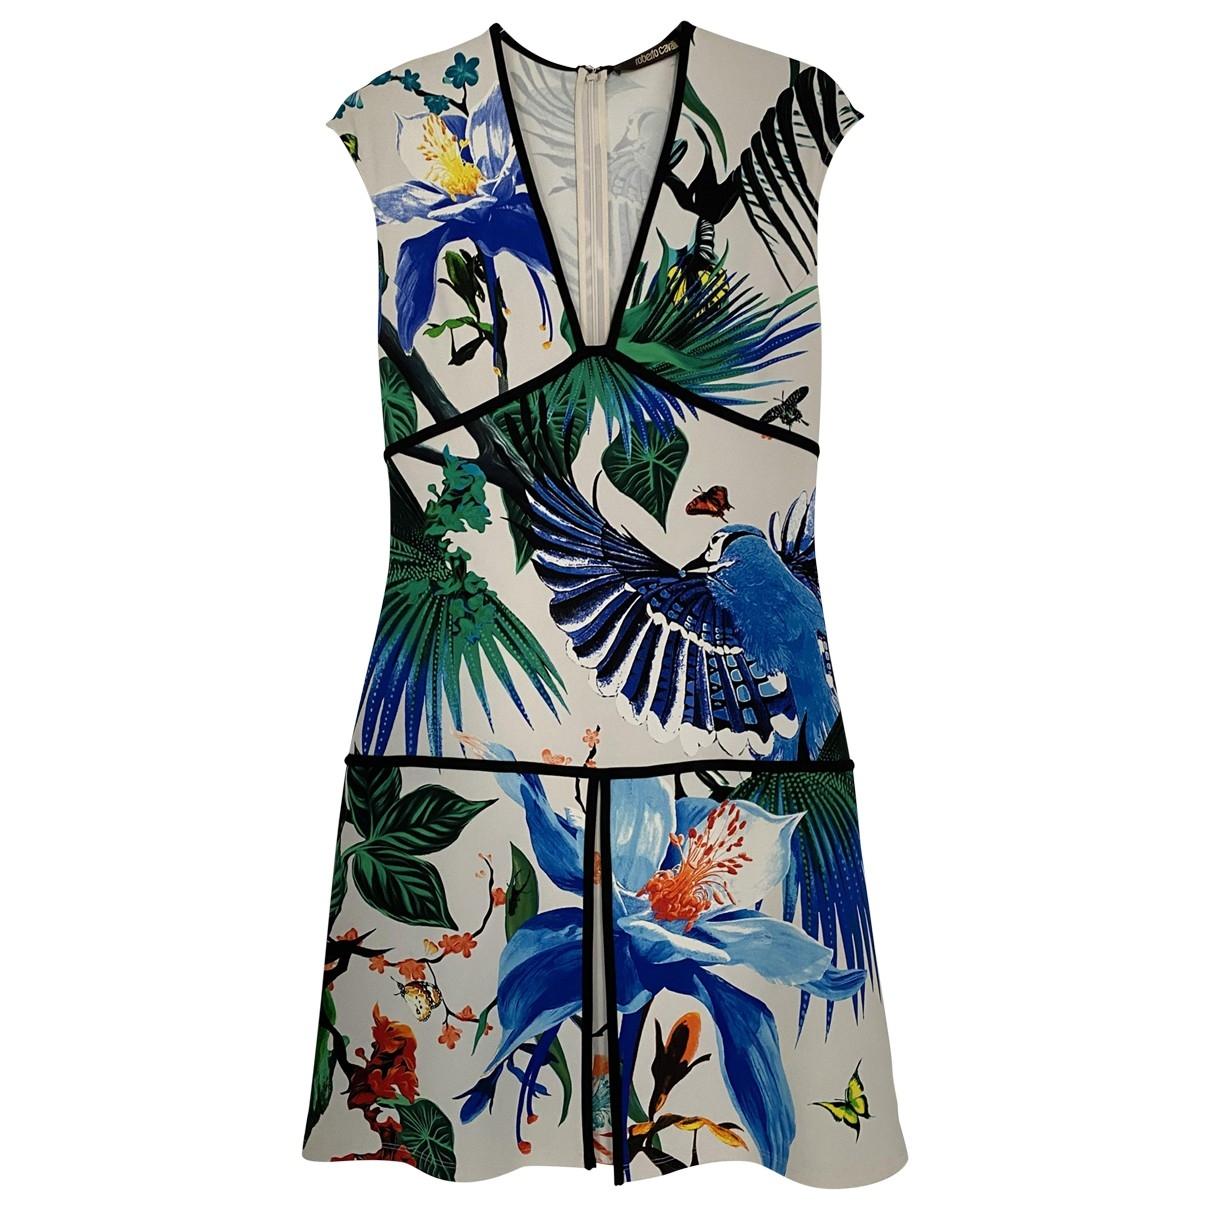 Roberto Cavalli \N Multicolour dress for Women 38 IT